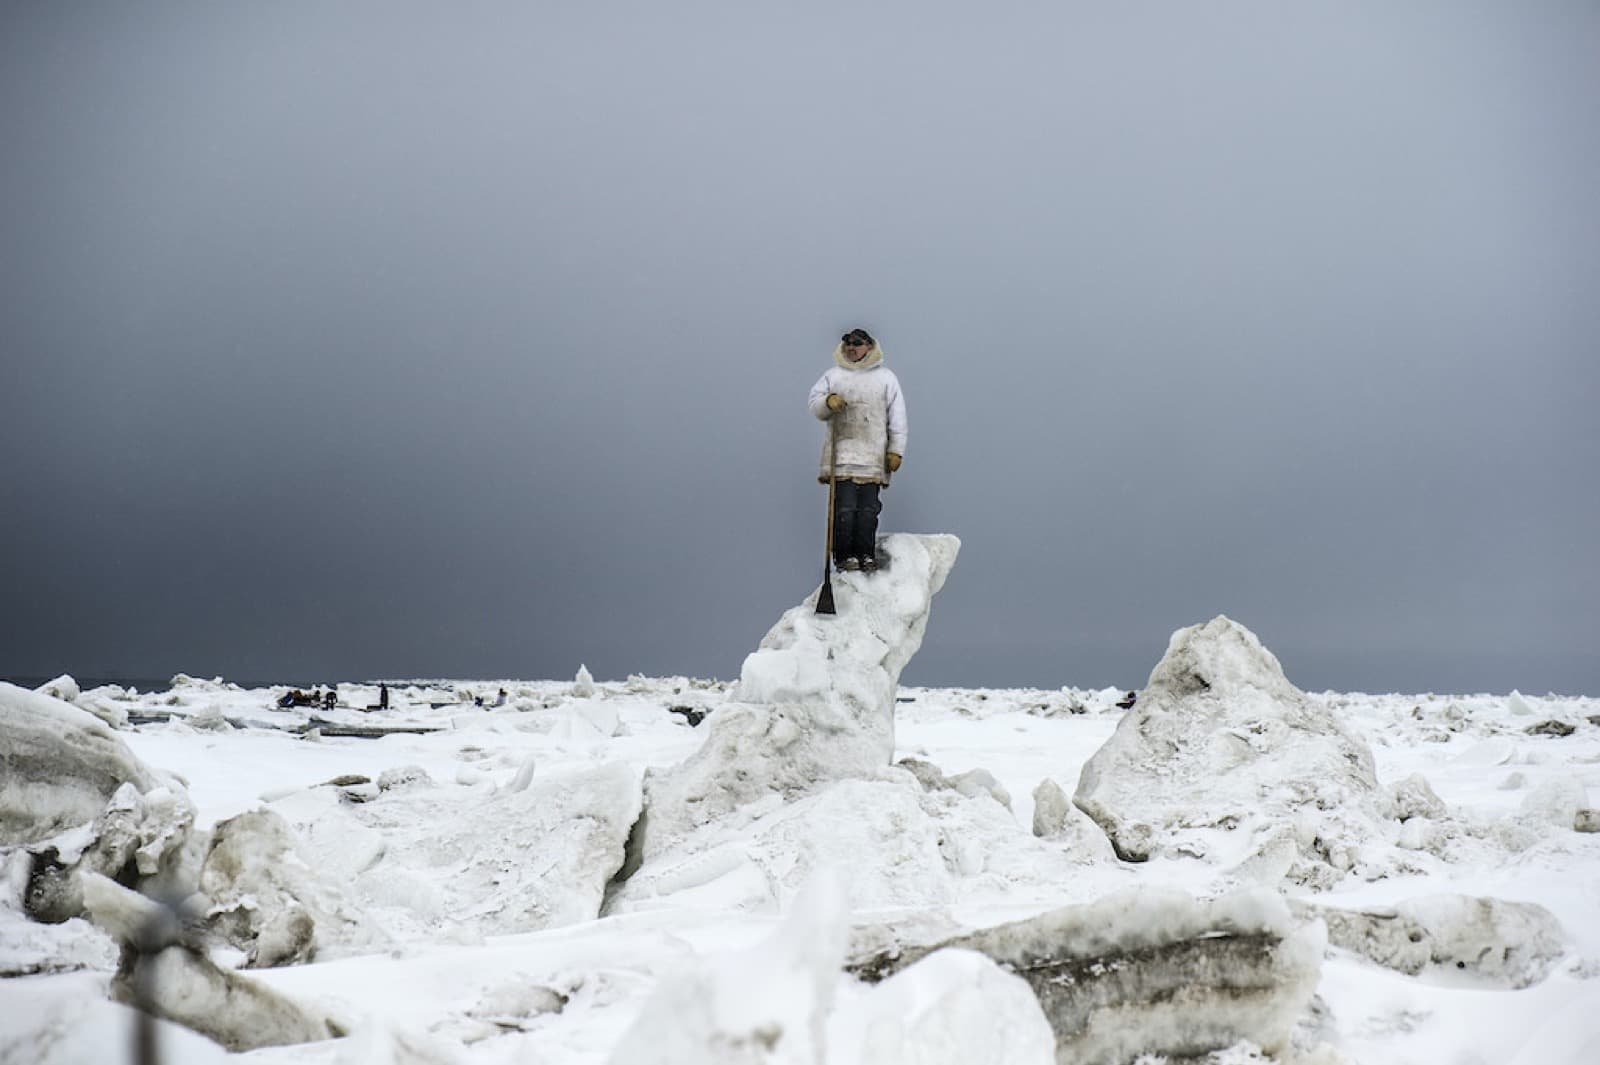 Khadir Van Lohuizen e Yuri Kozirev – Arctic New Frontier